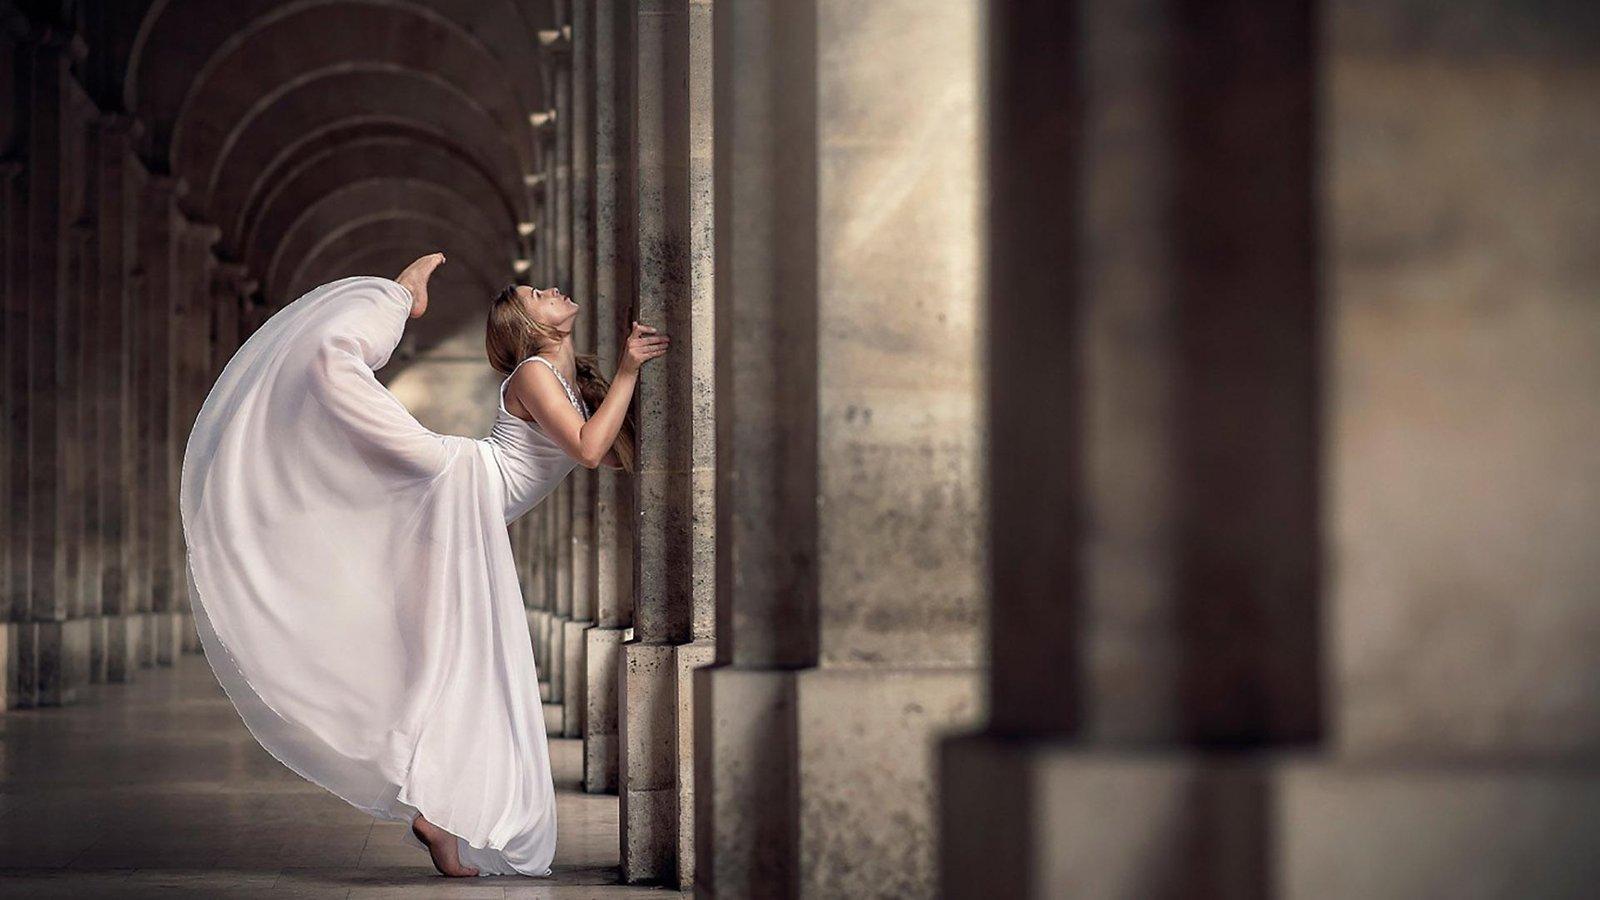 beautiful_ballet_pc_wallpaper